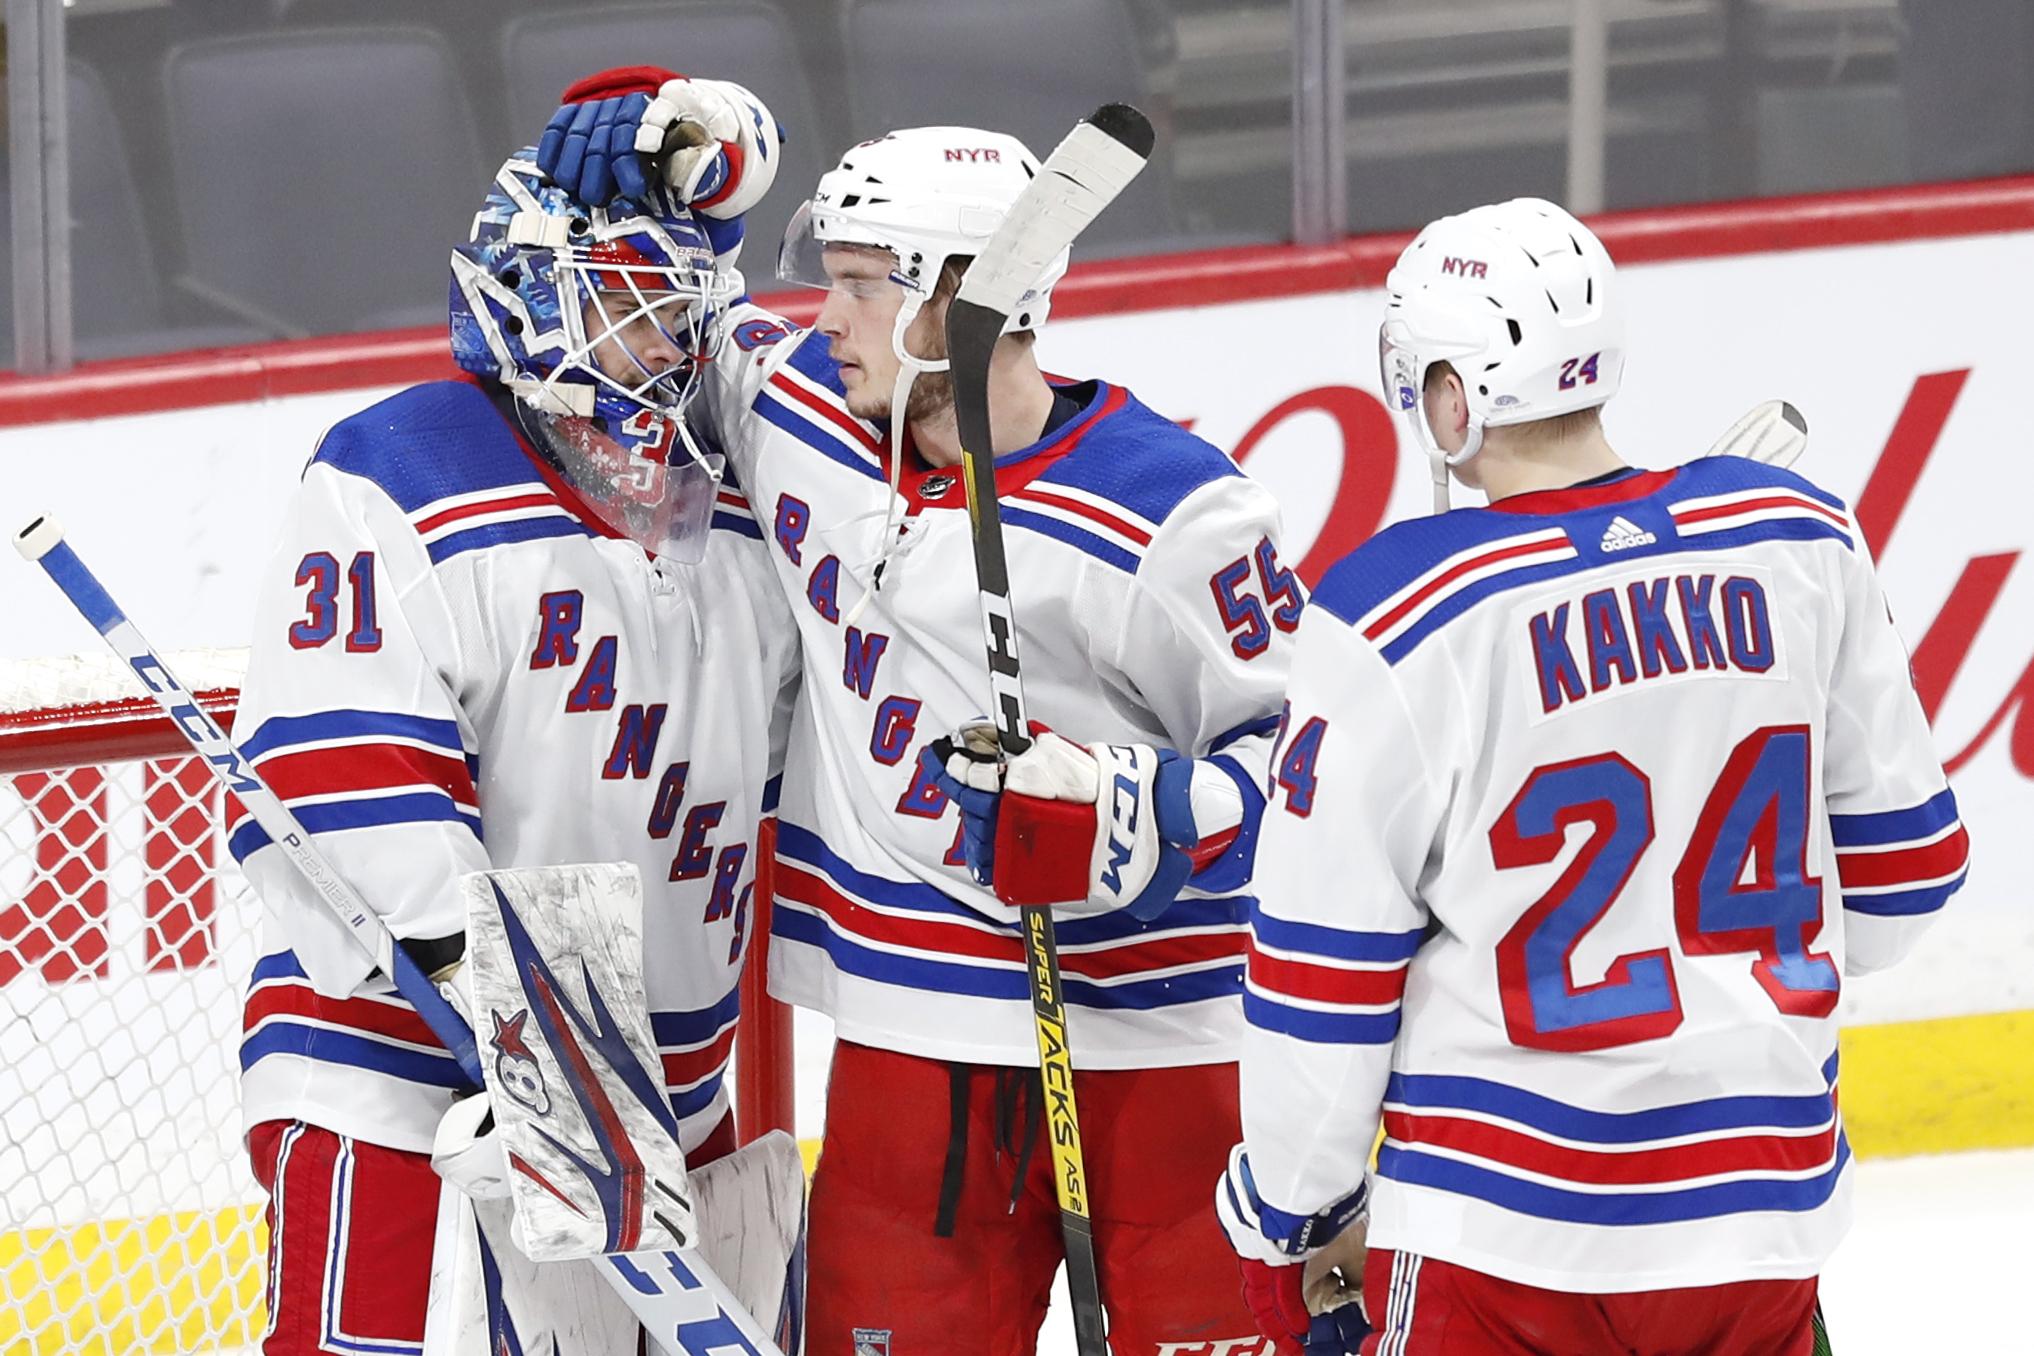 NHL: New York Rangers at Winnipeg Jets